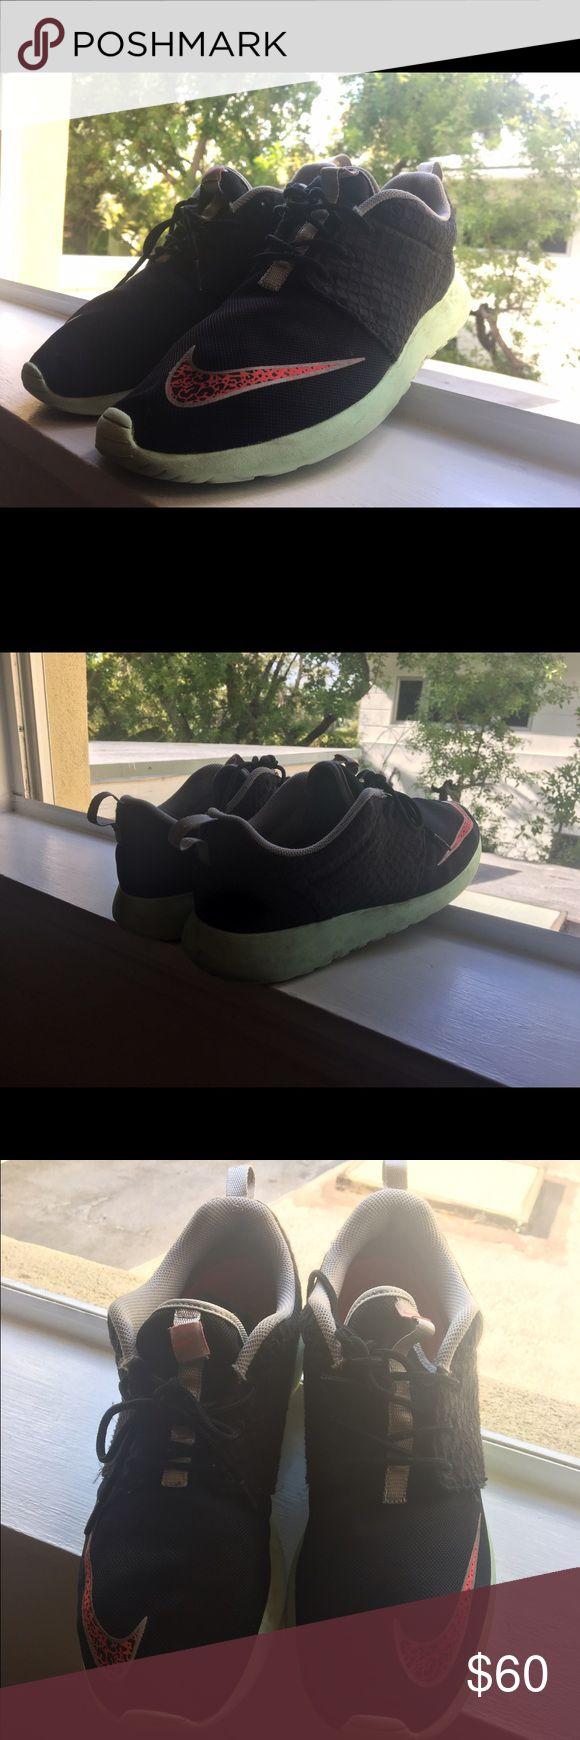 Yeezy Roshe Run Rare Roshe Run. Inspired by Kanye West's Nike Yeezy. Nike Shoes